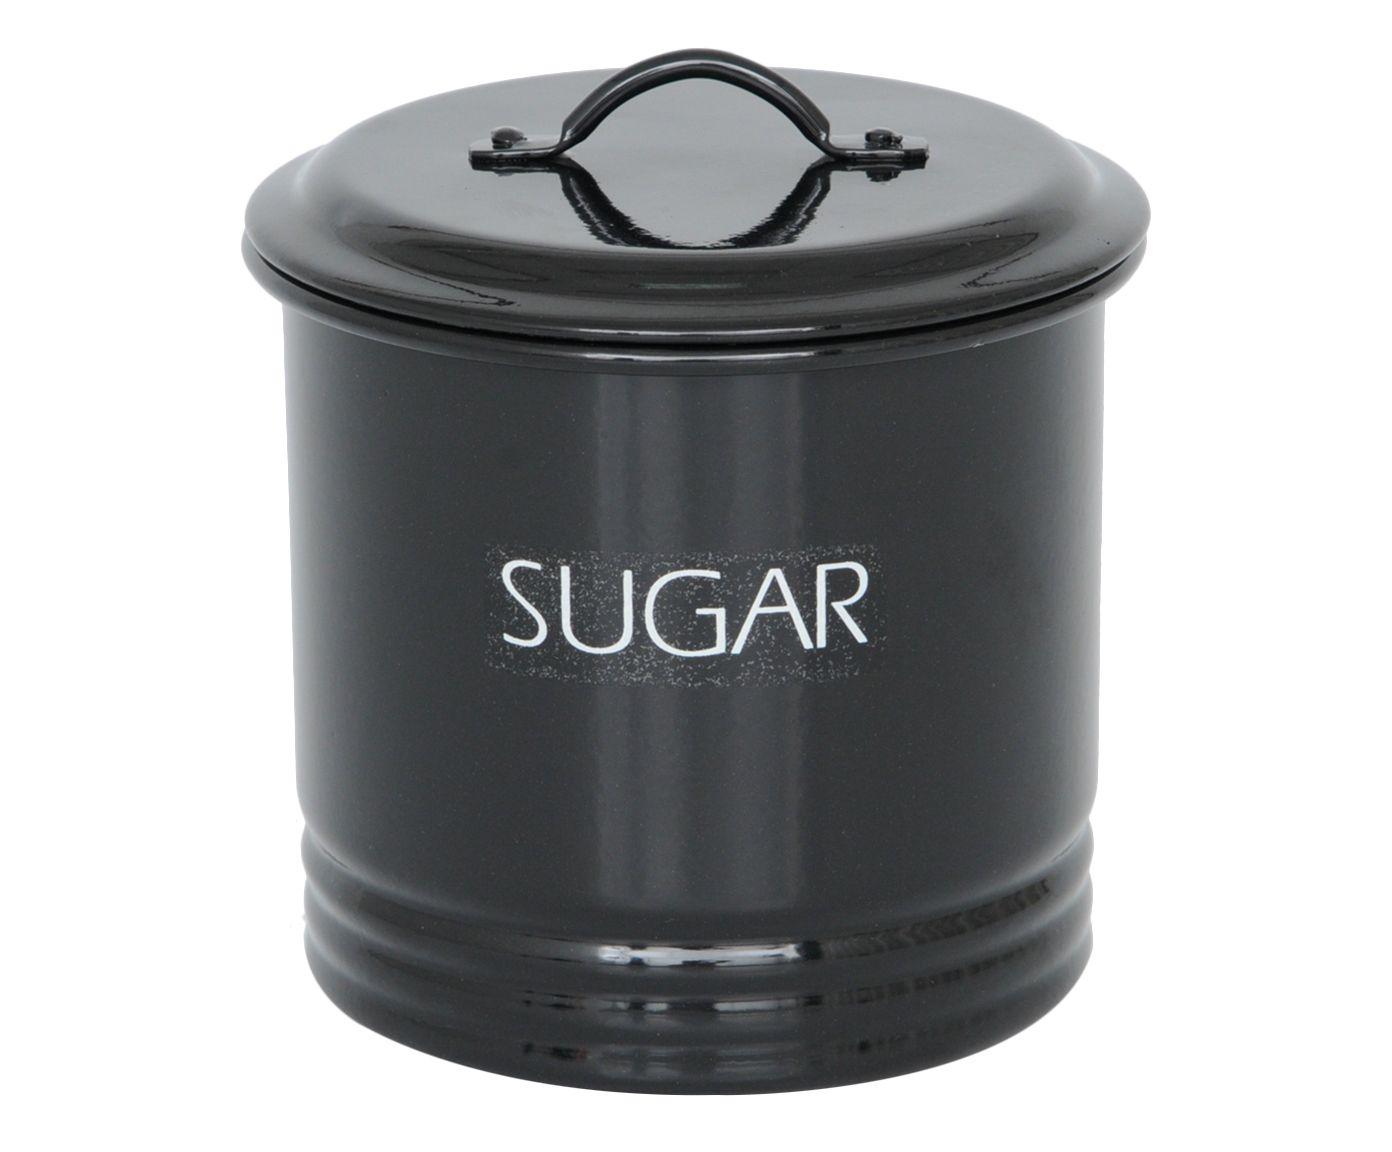 Lata Sugar Preta - 1,75L | Westwing.com.br